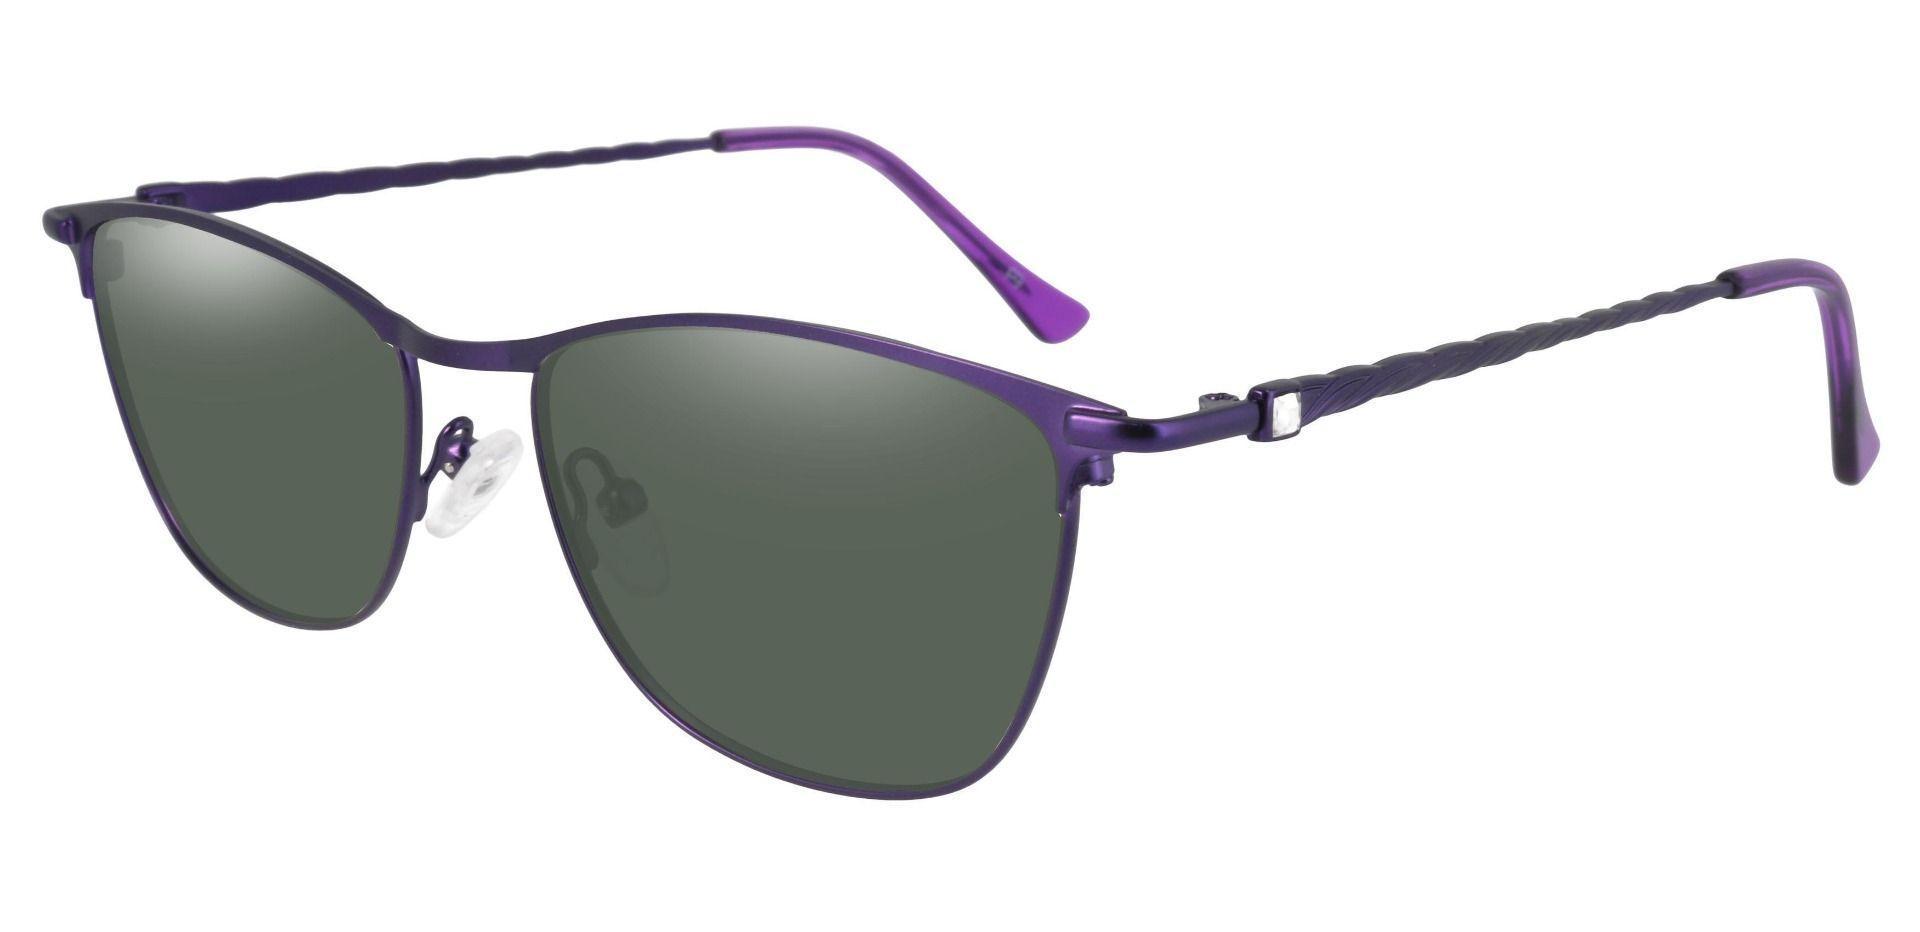 Andrea Cat Eye Reading Sunglasses - Purple Frame With Green Lenses